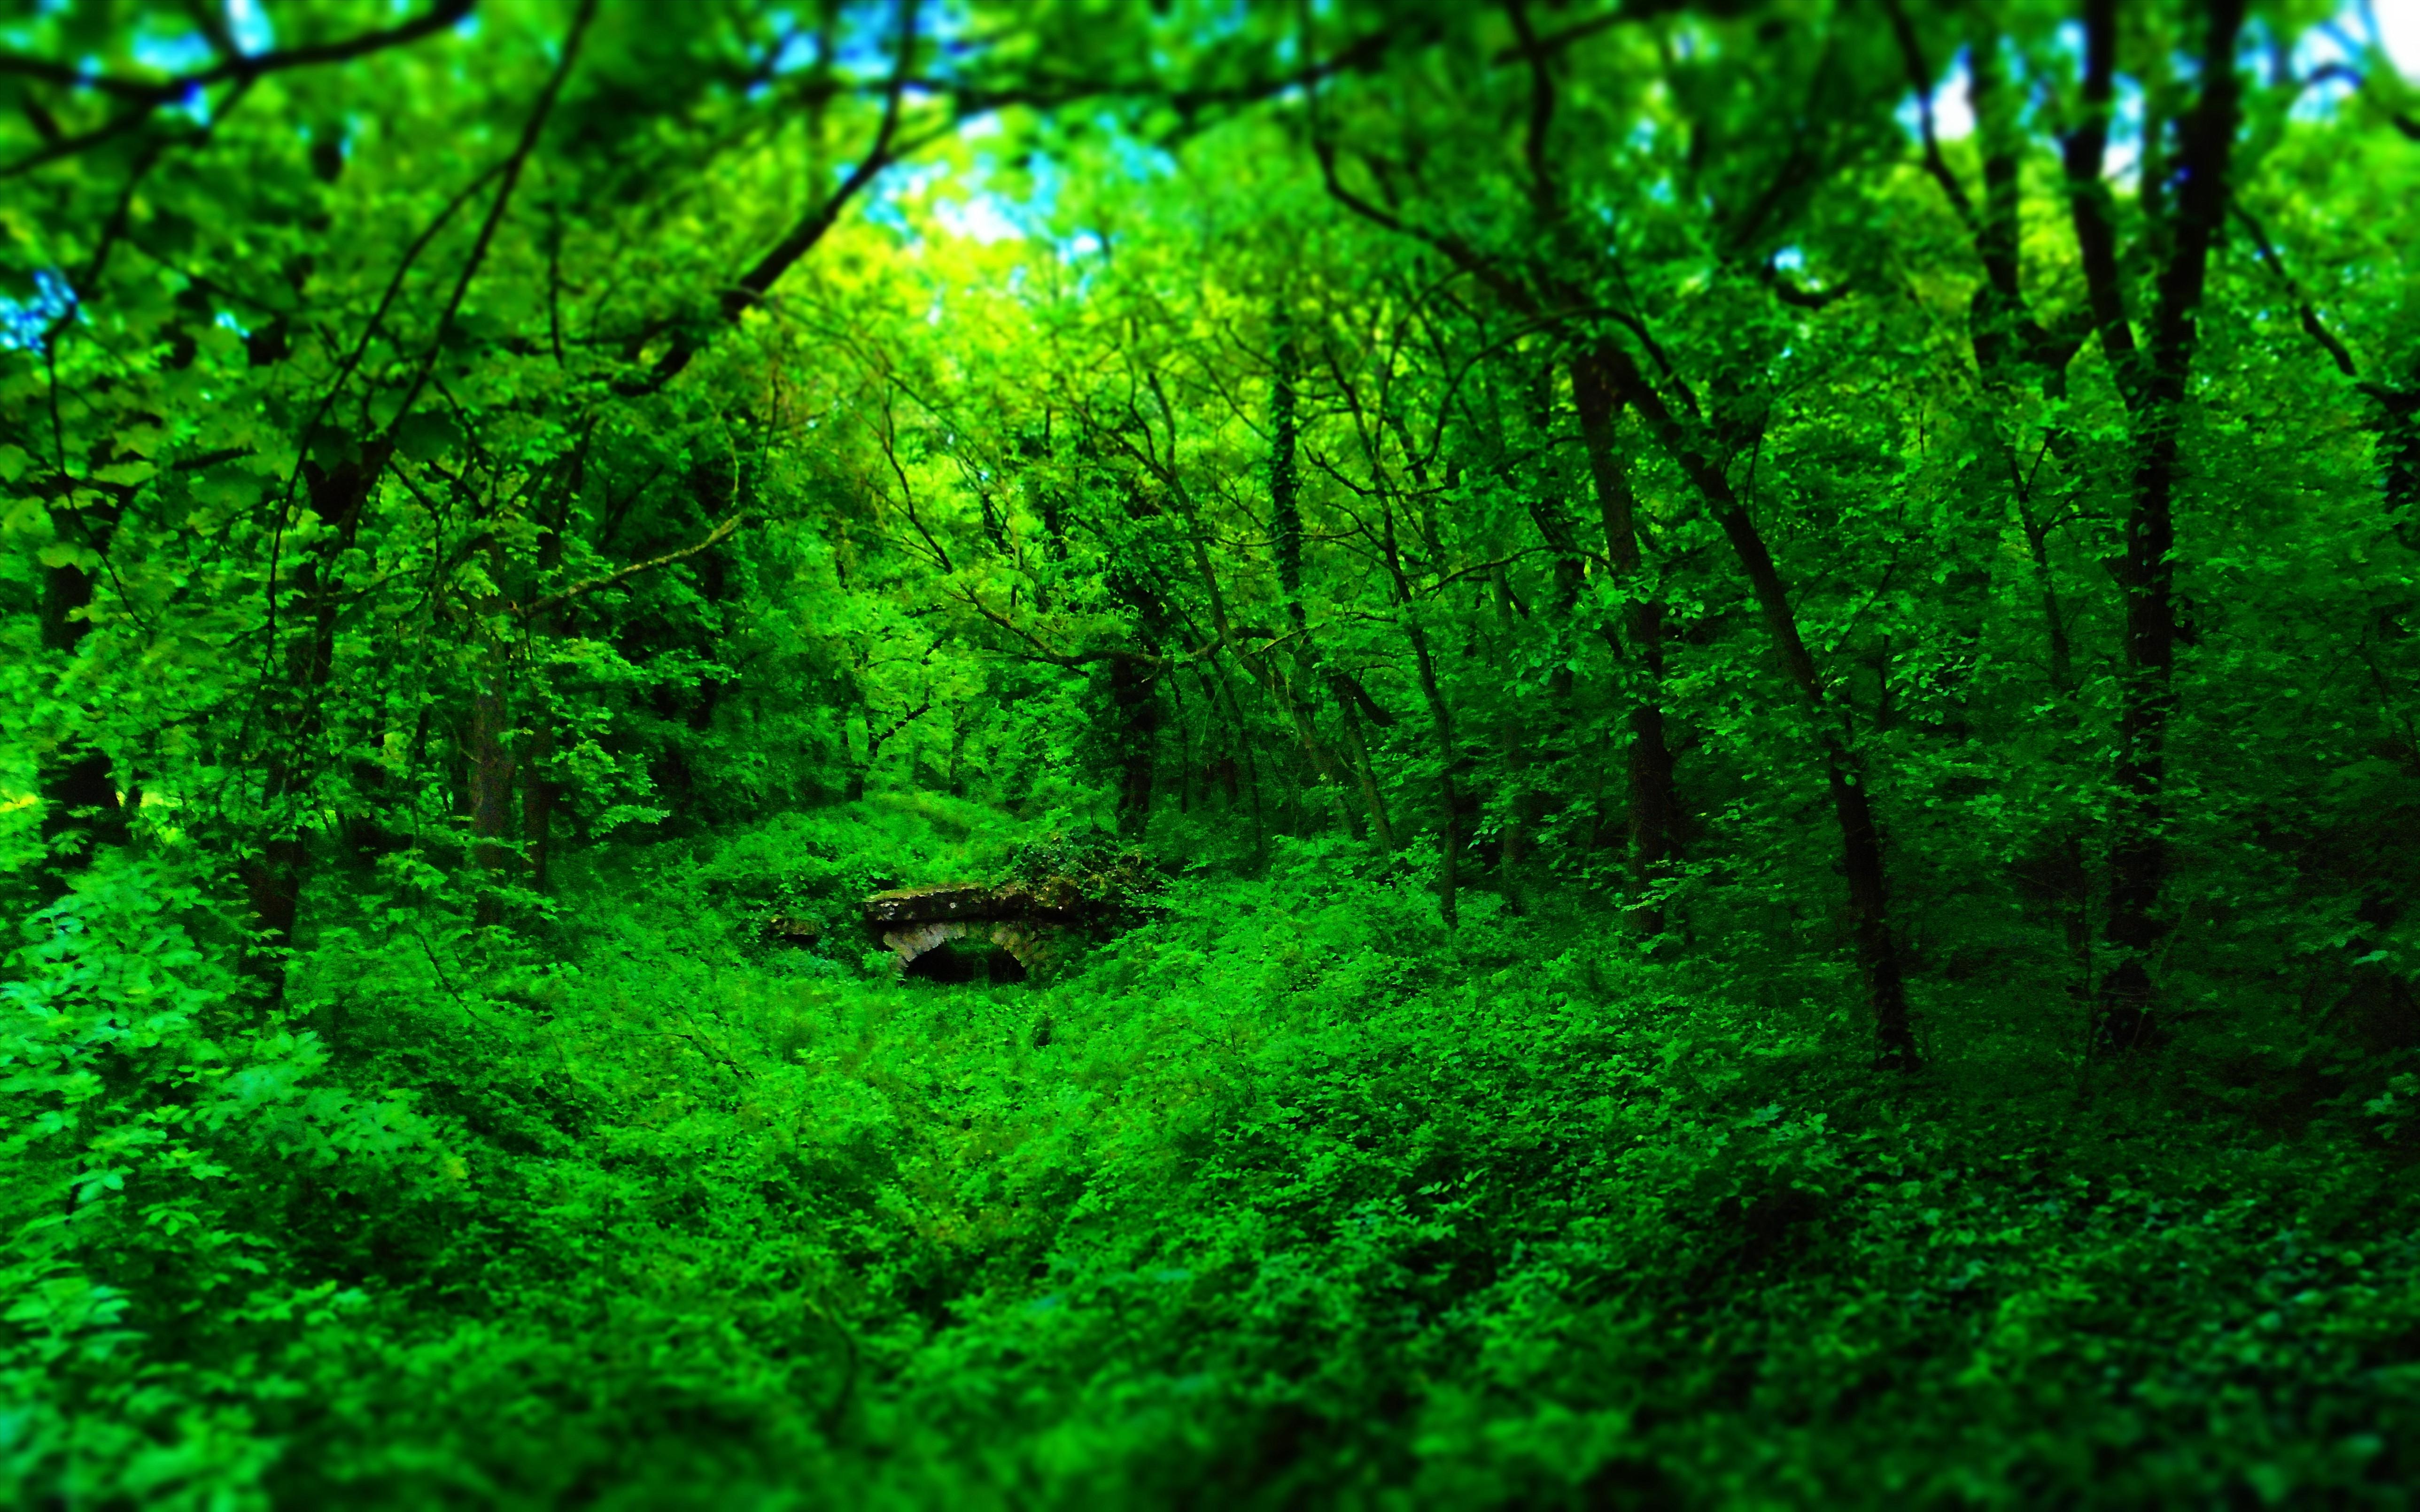 wallpaper : 5152x3220 px, bridge, forest, green, landscape, nature